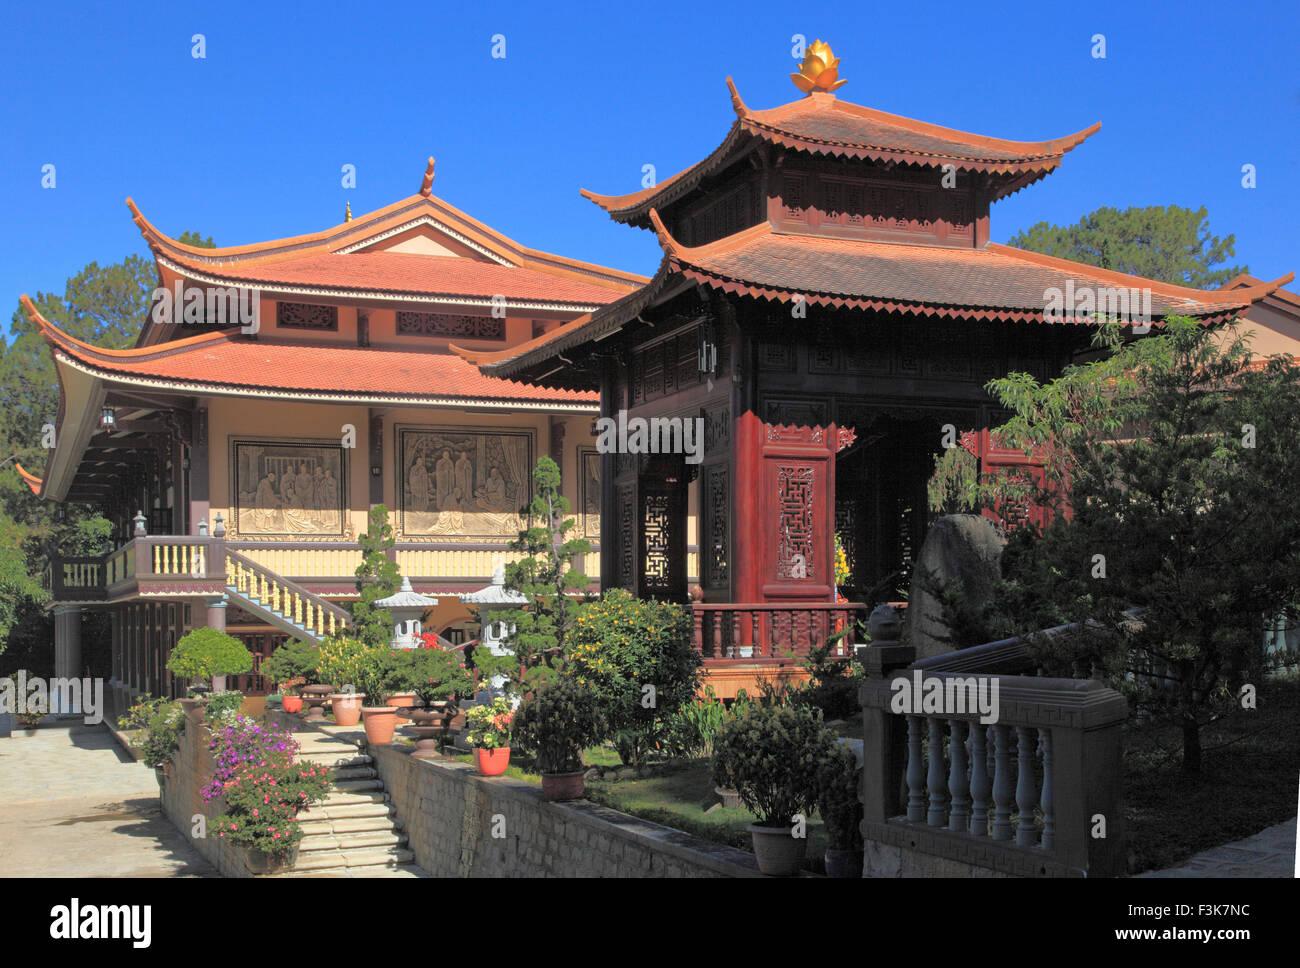 Vietnam, Dalat, Truc Lam, zen buddhist temple, - Stock Image